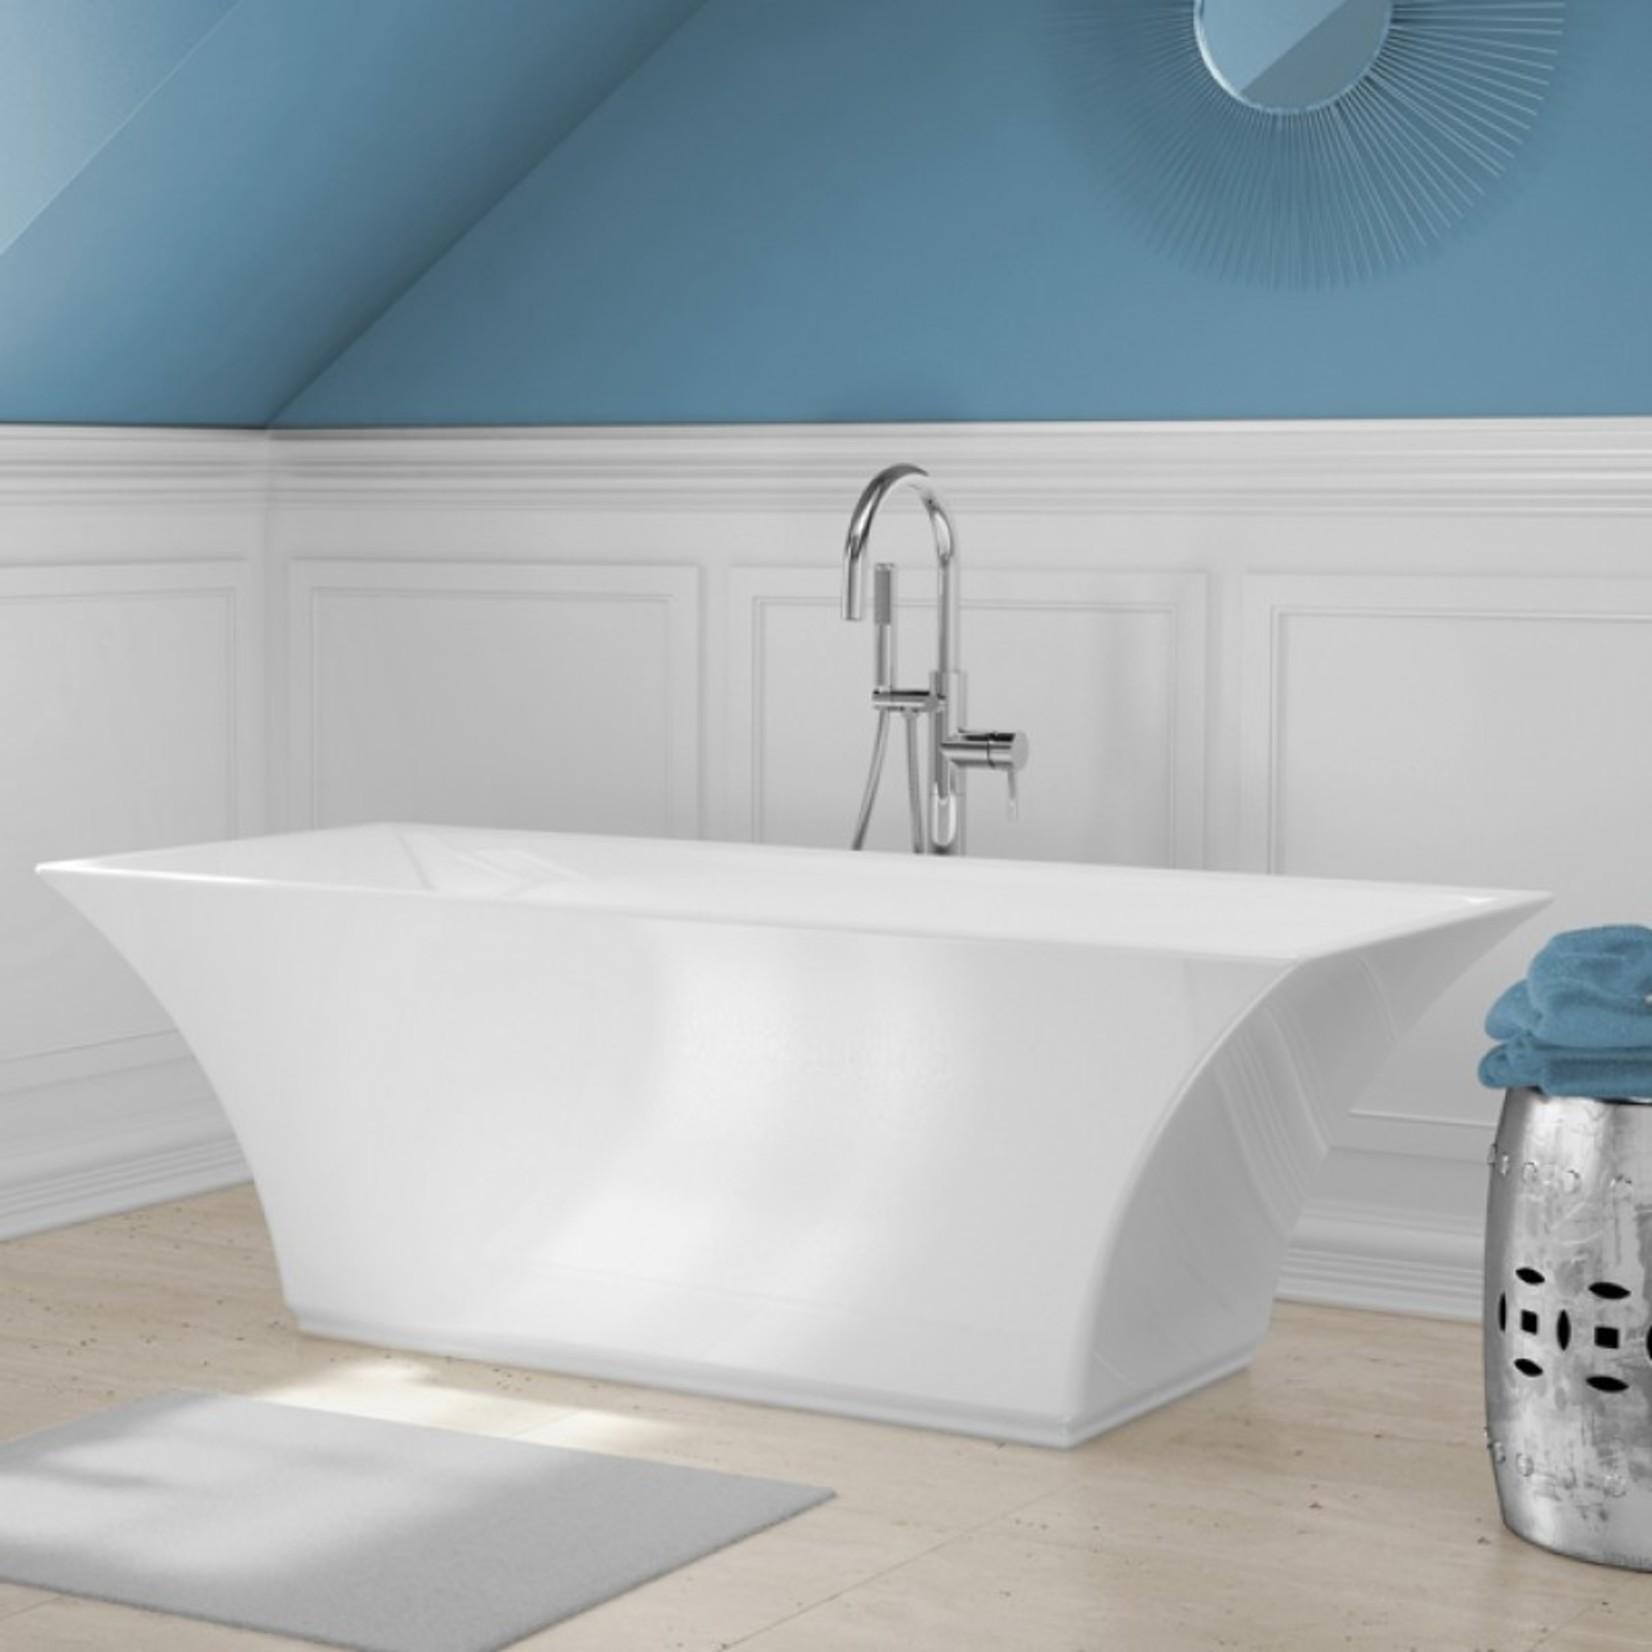 Deluxe Freestanding Bathtub Olivia